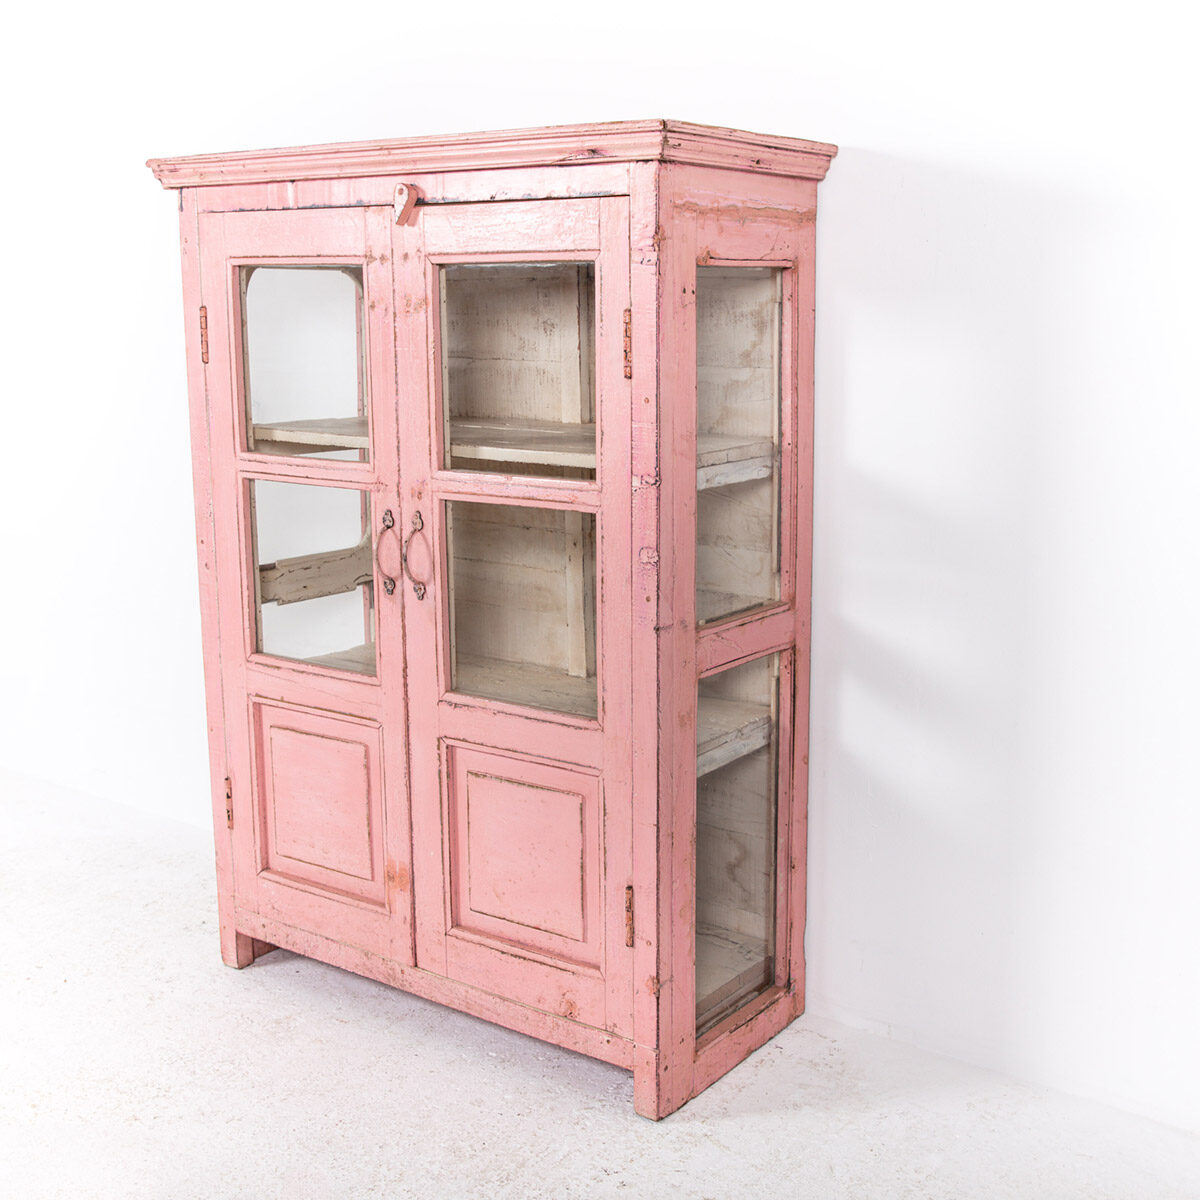 Roze-vitrinekast-2-glazen-deuren-7